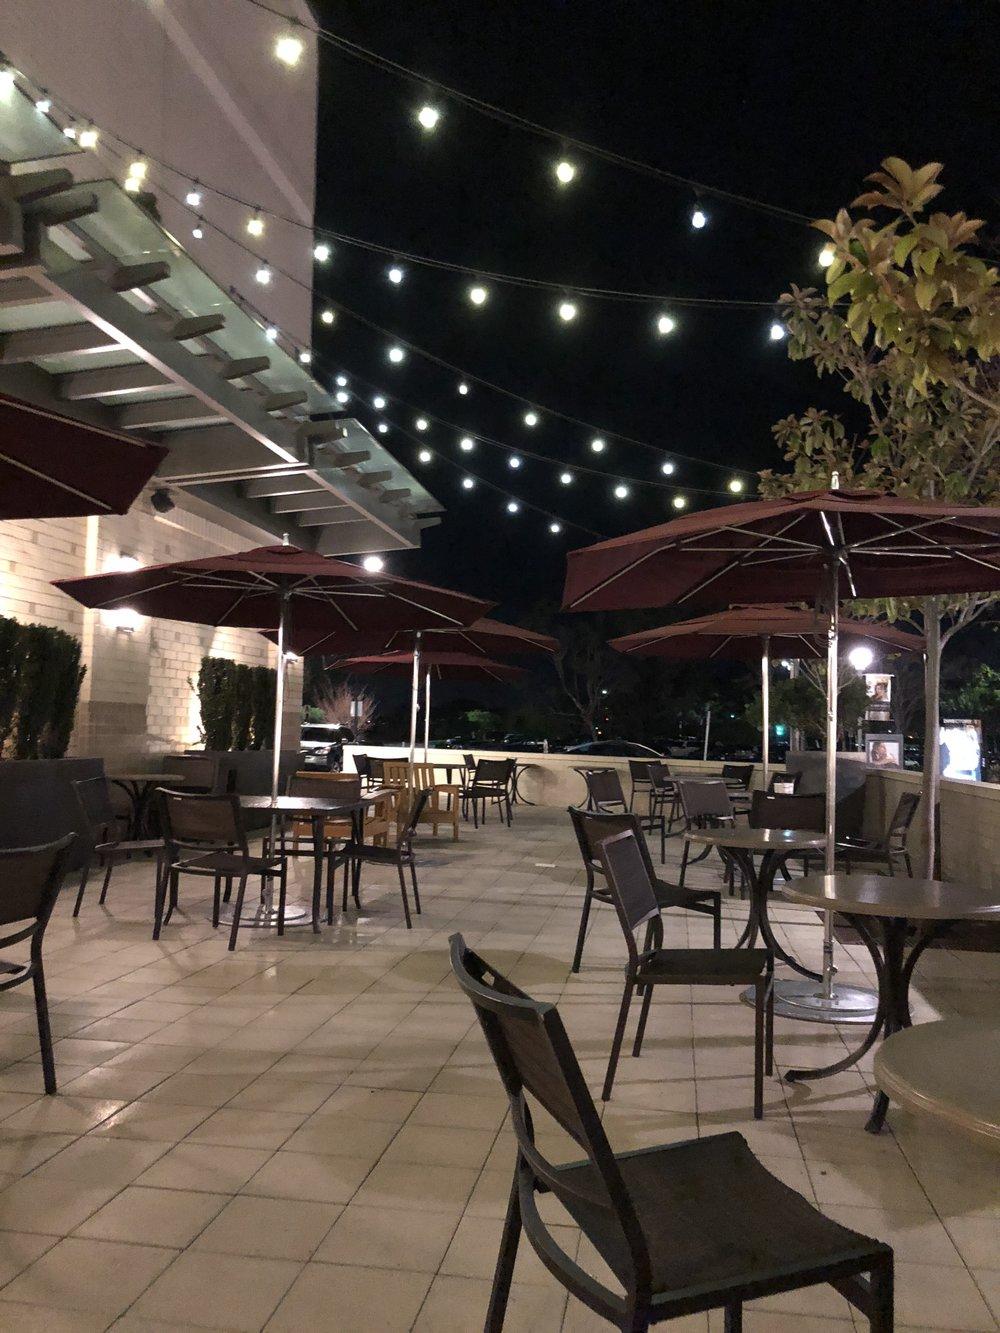 Nordstroms Courtyard Corte Madera